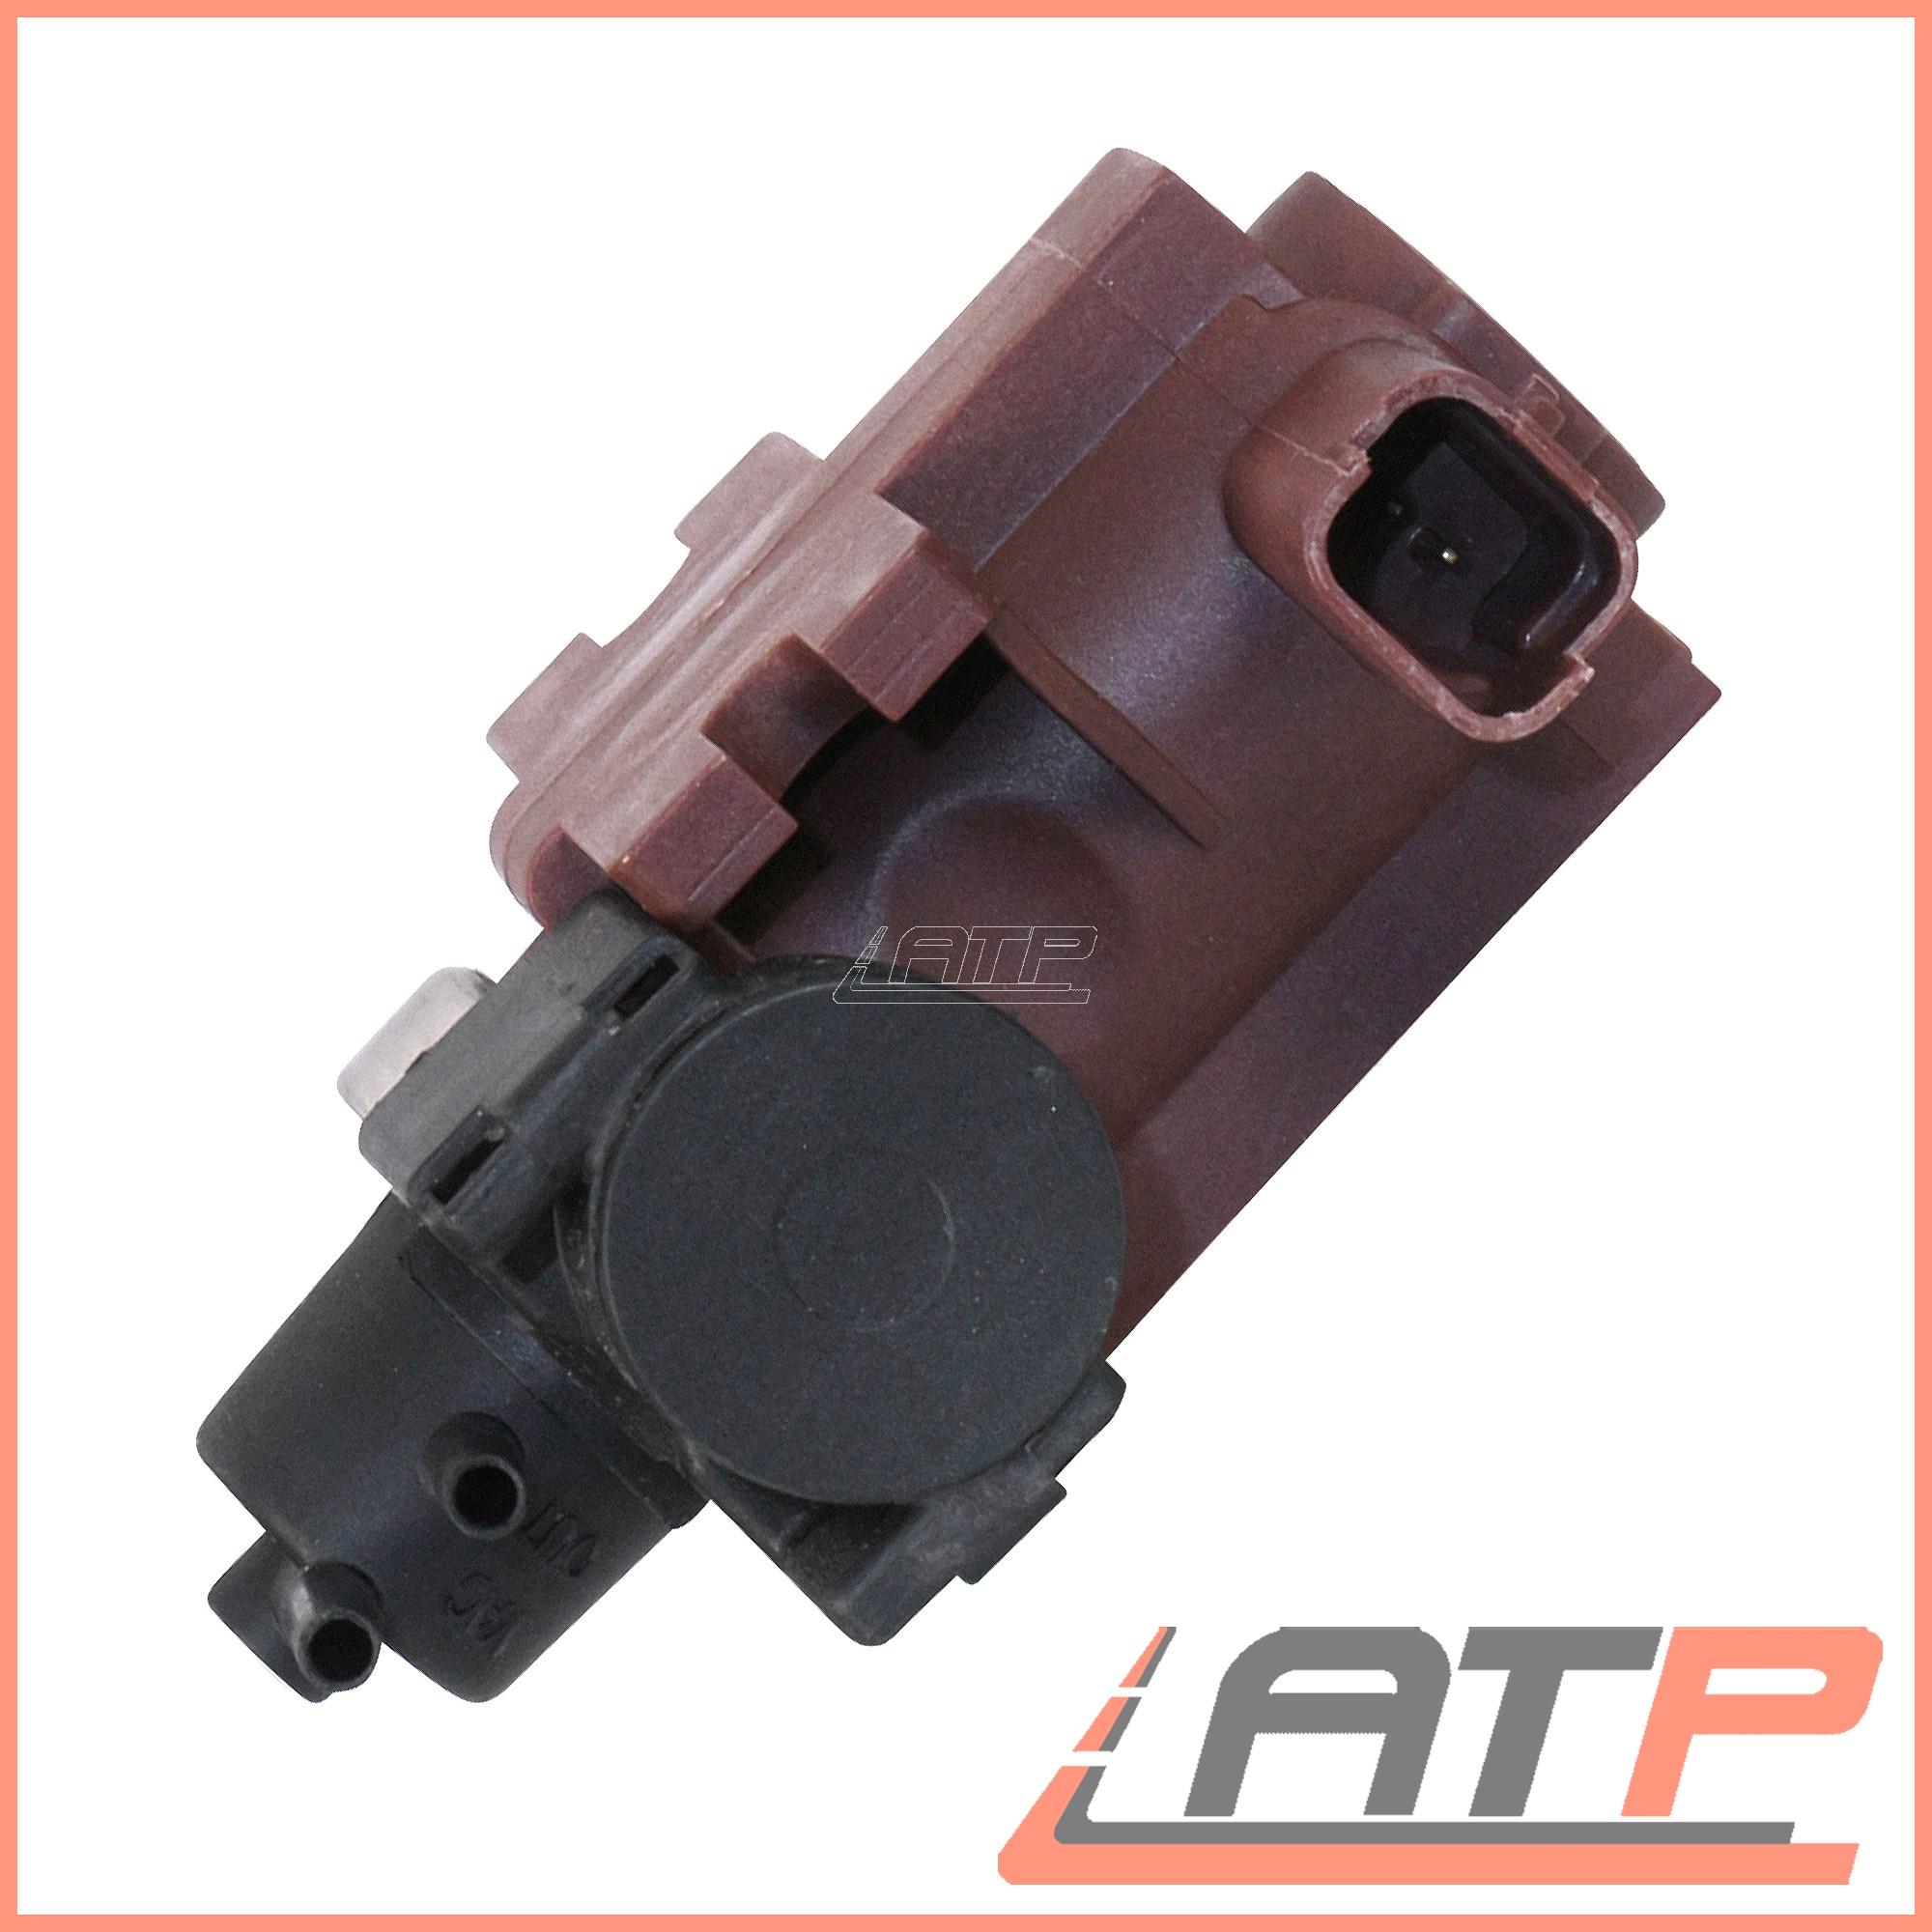 1X PRESSURE CONVERTER VOLVO S40 MK 2 04-10 S80 2 08 V70 3 07-15 C30 V50 2.0 D